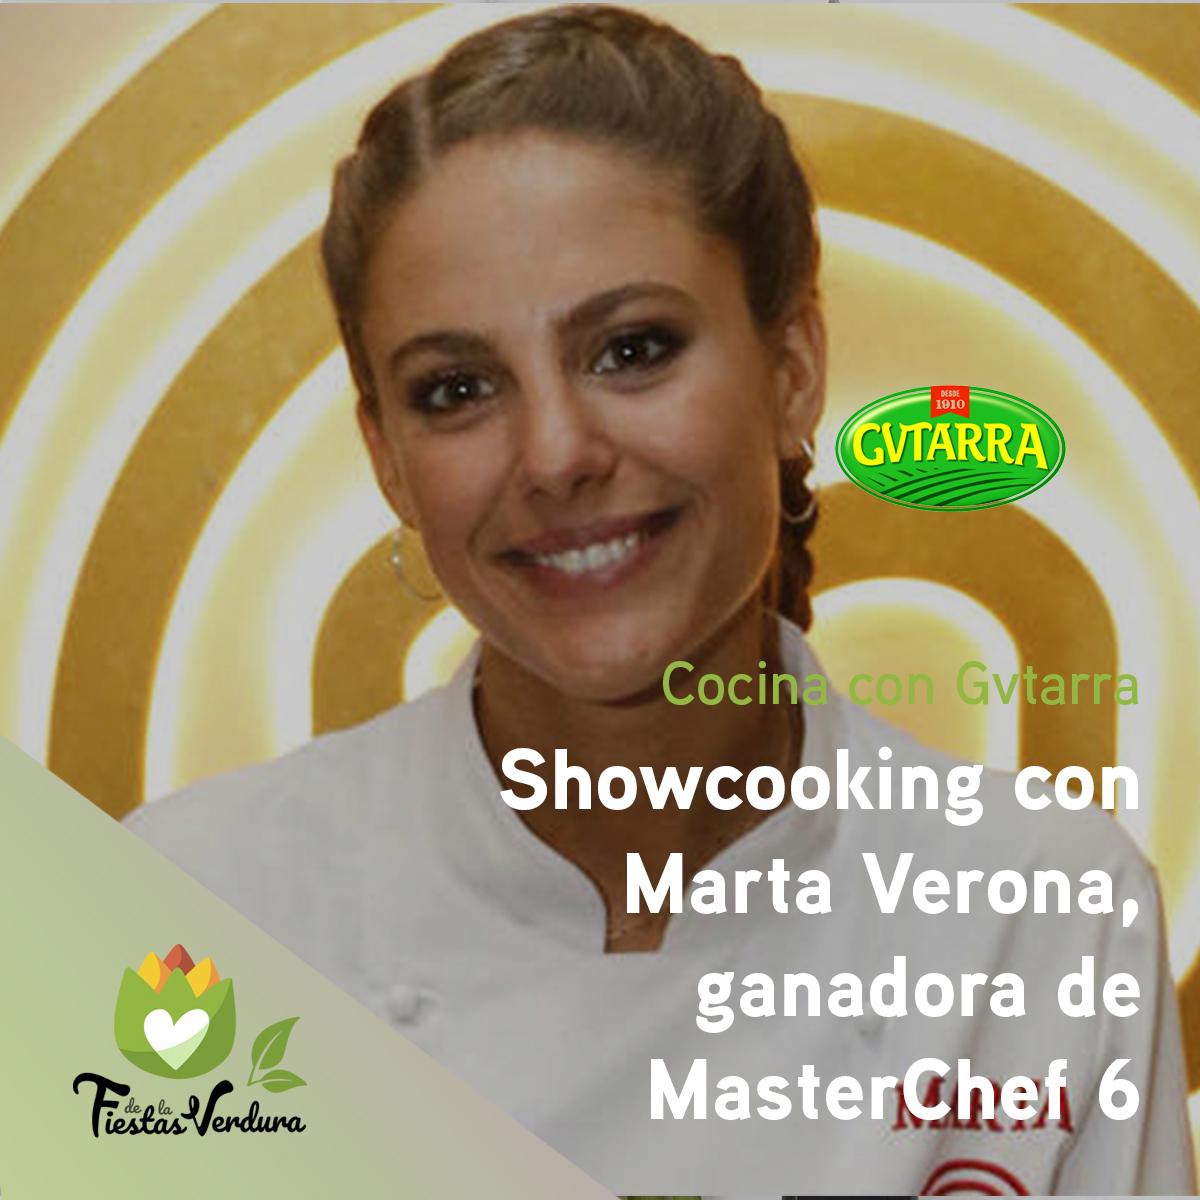 Showcooking Marta Verona